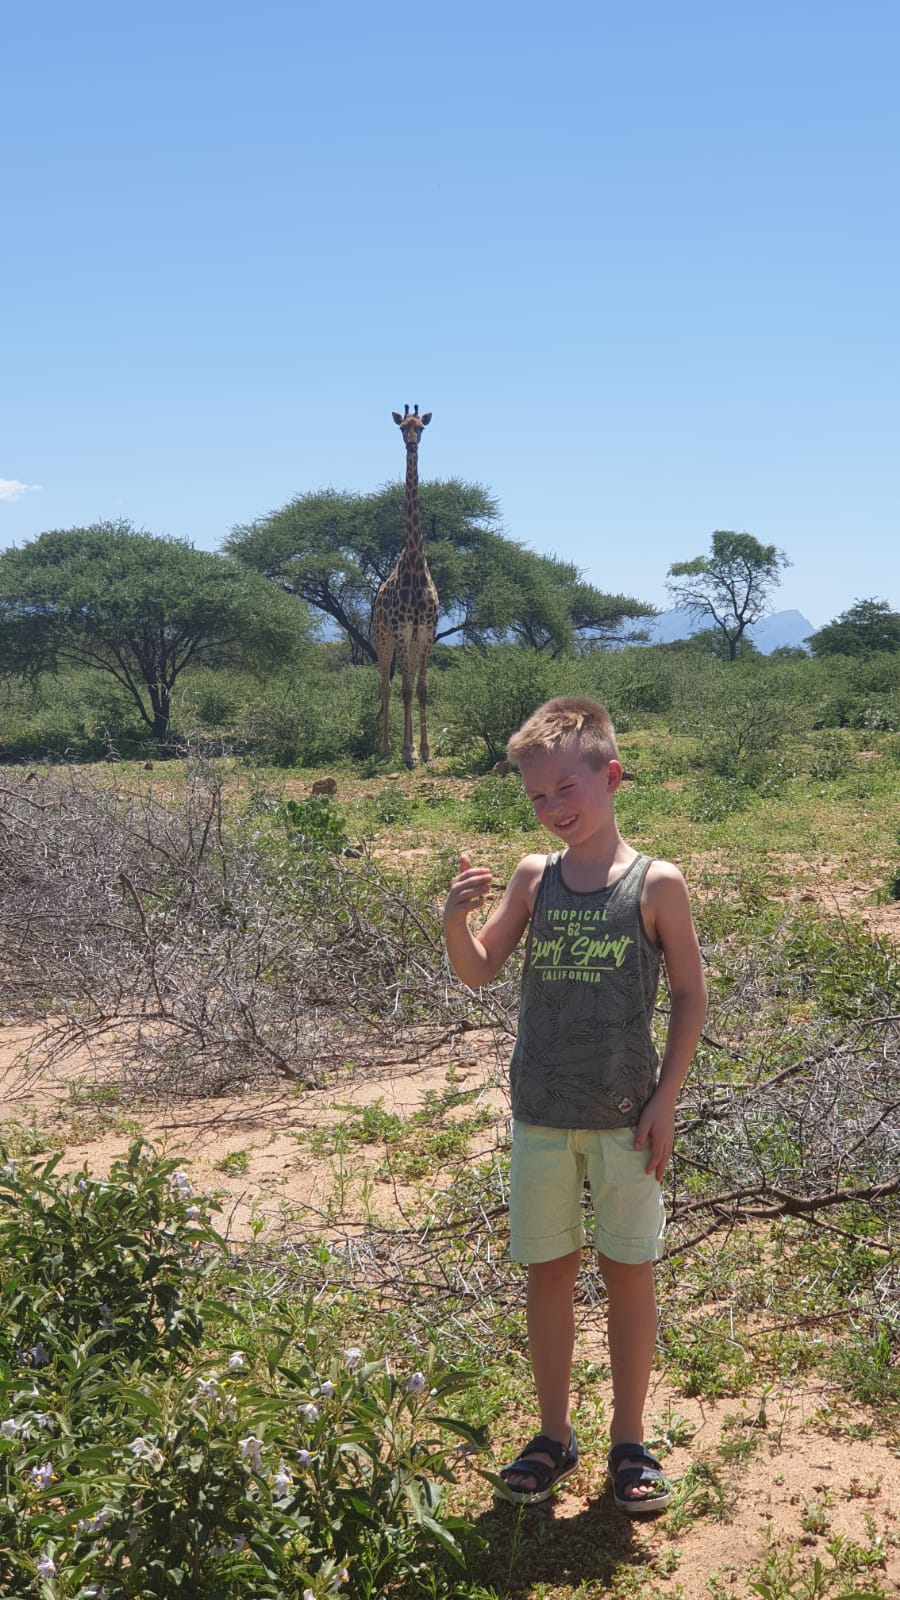 Zuid-Afrika familiereis - Giraffe